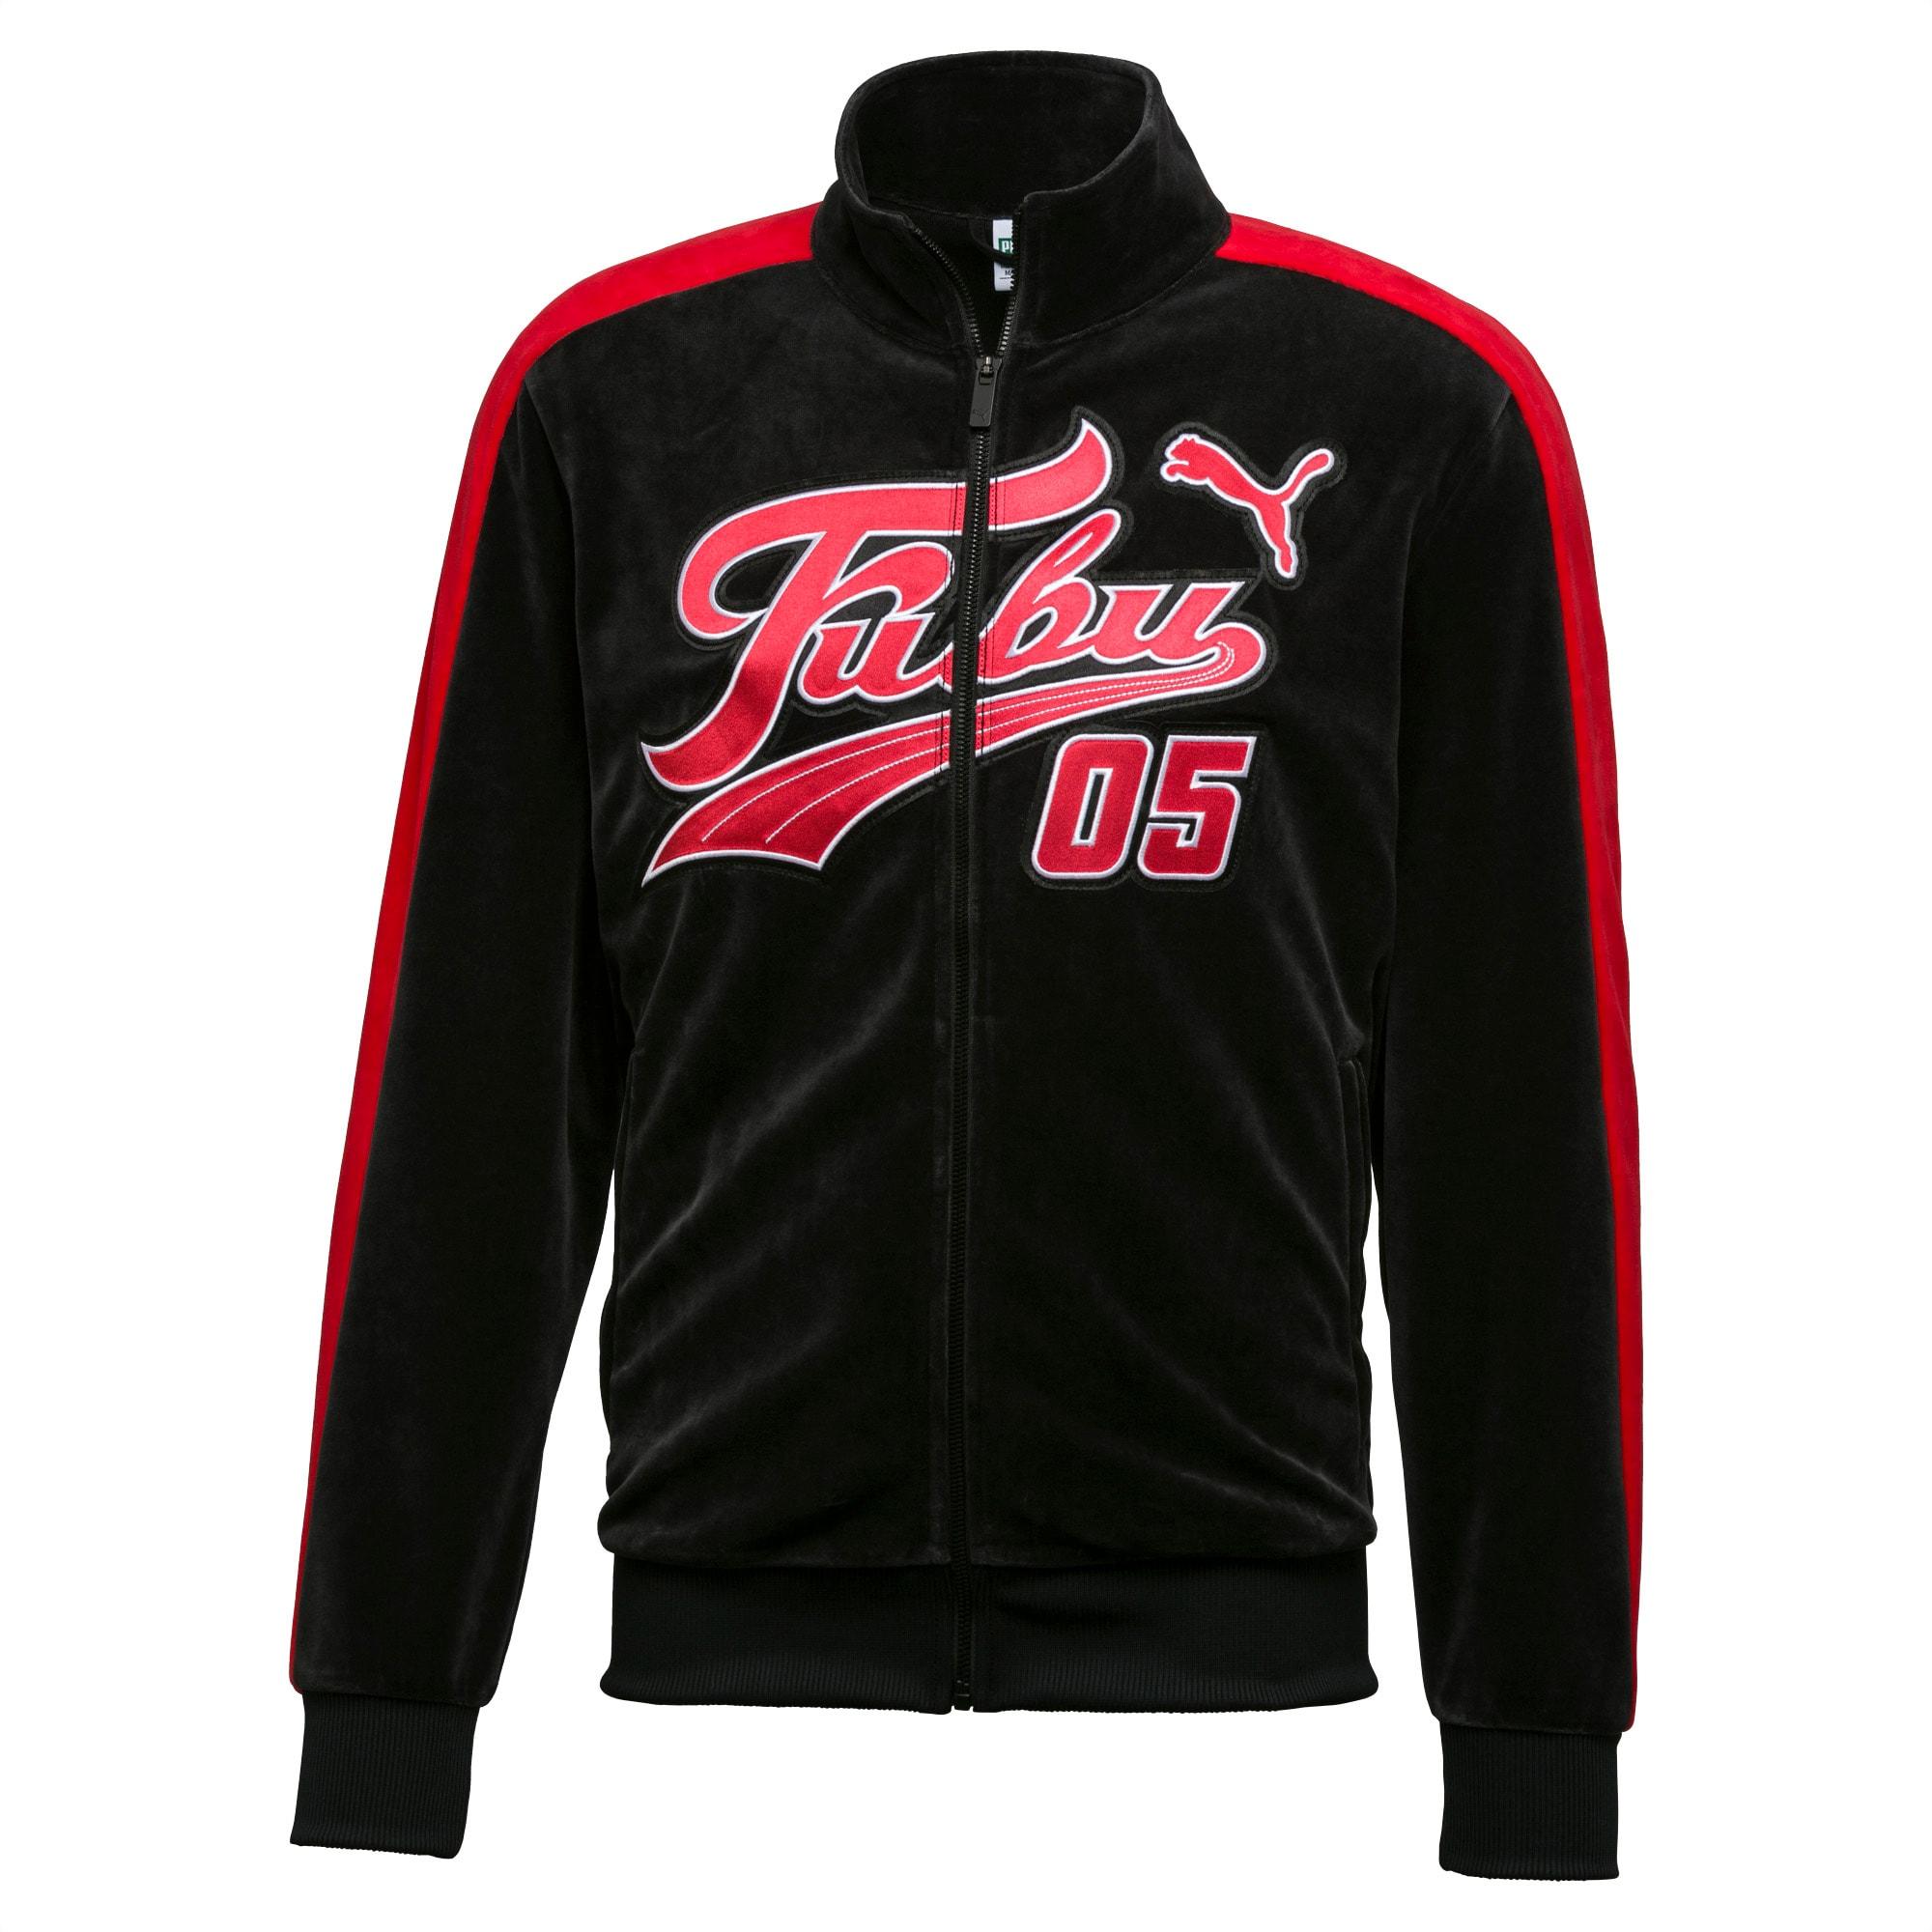 Puma x FUBU Jacket | Zwart | Sportjacks | 577091 01 | Caliroots